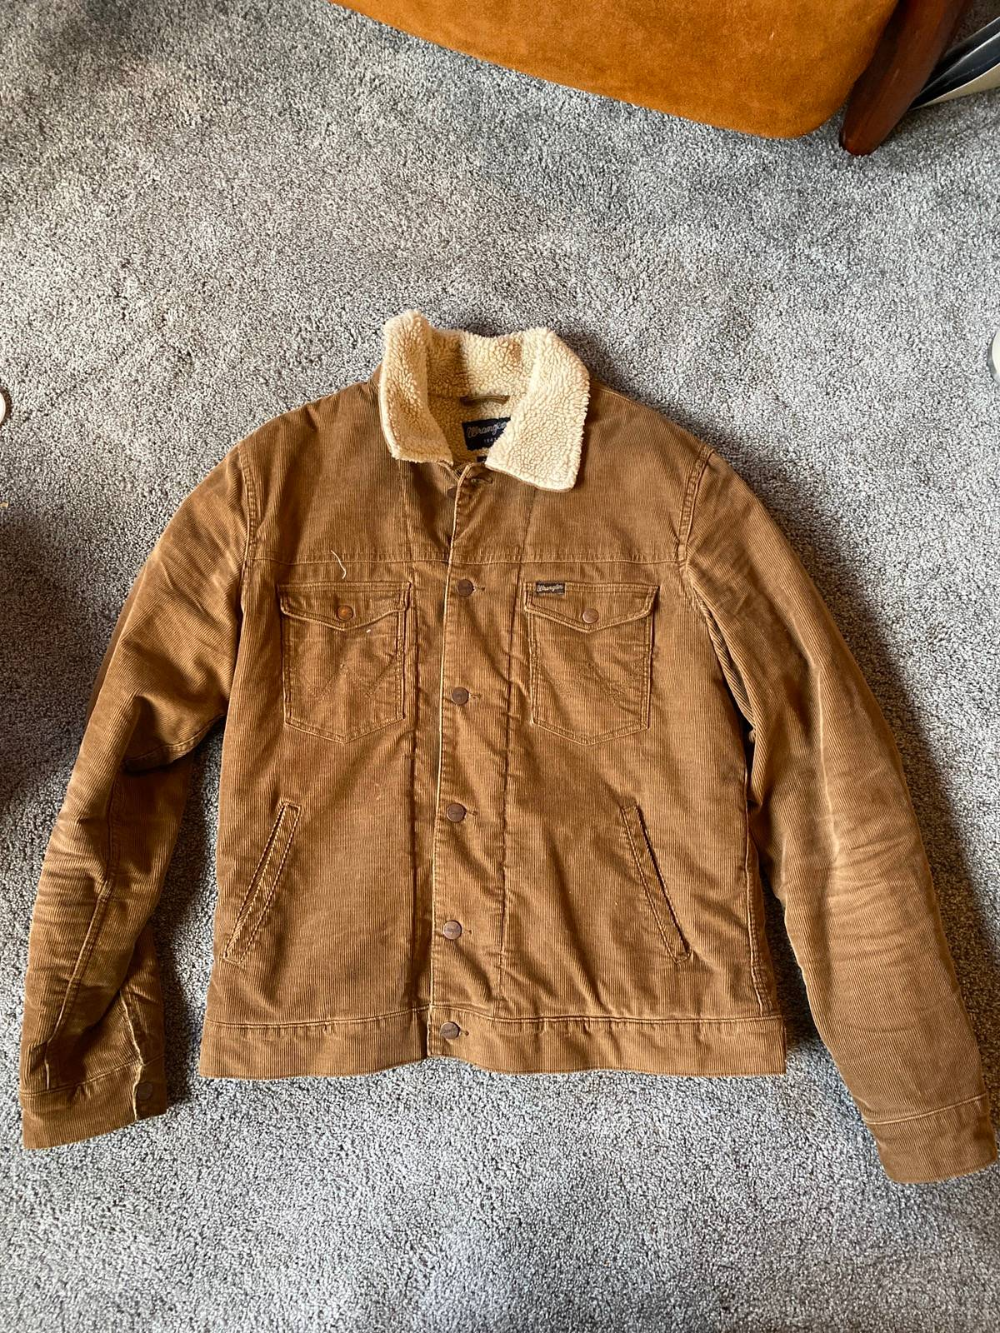 Wrangler Wrangler Desert Cord Sherpa Size L 45 Wrangler Outerwear Sherpa [ 1333 x 1000 Pixel ]